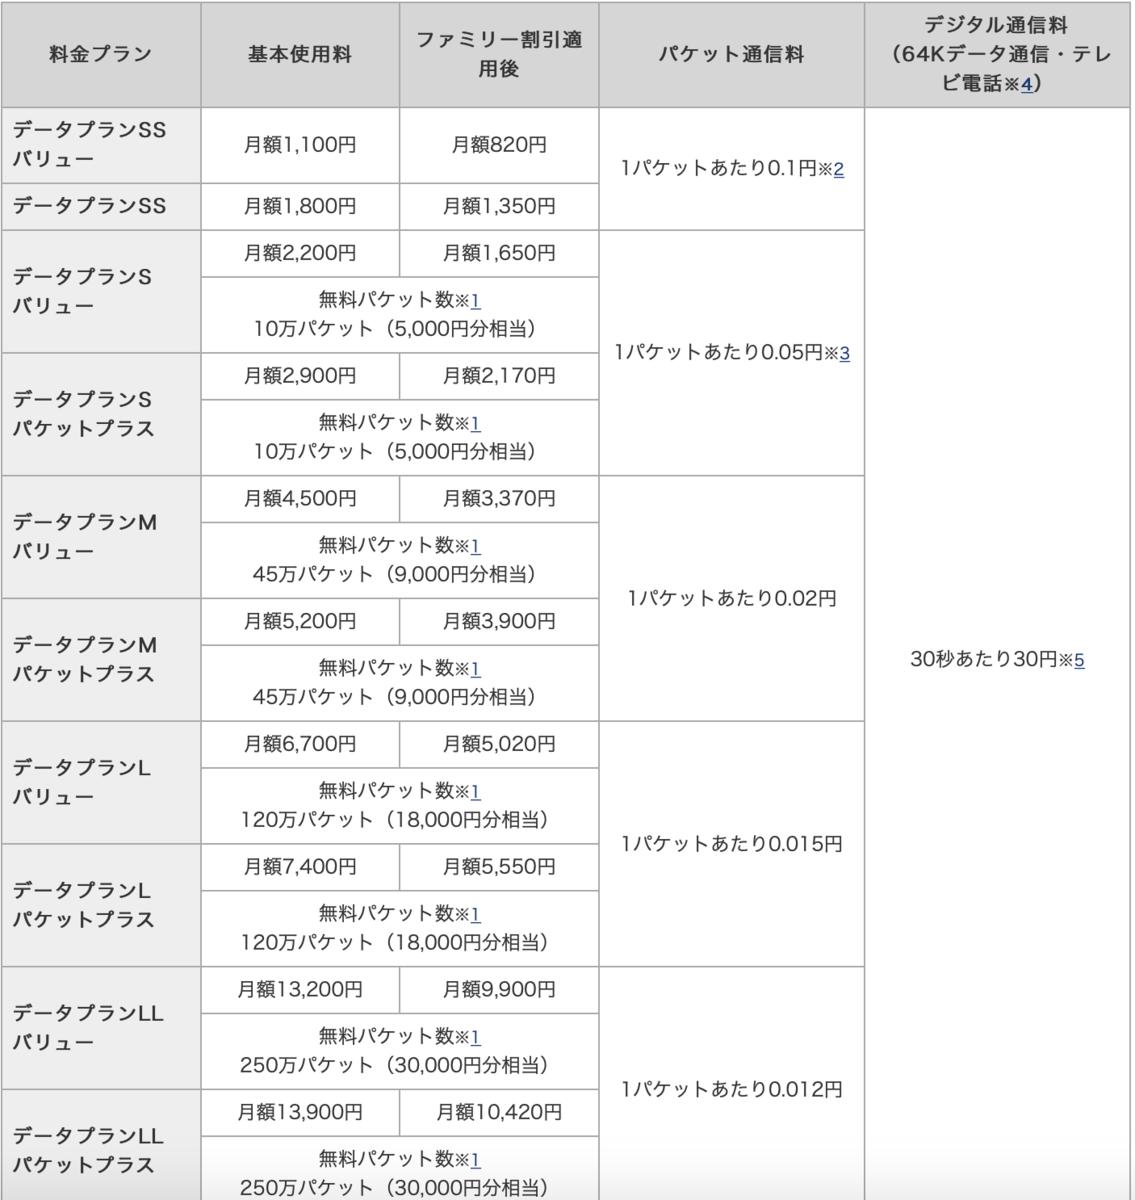 f:id:koiwai_chinatsu:20200111200153p:plain